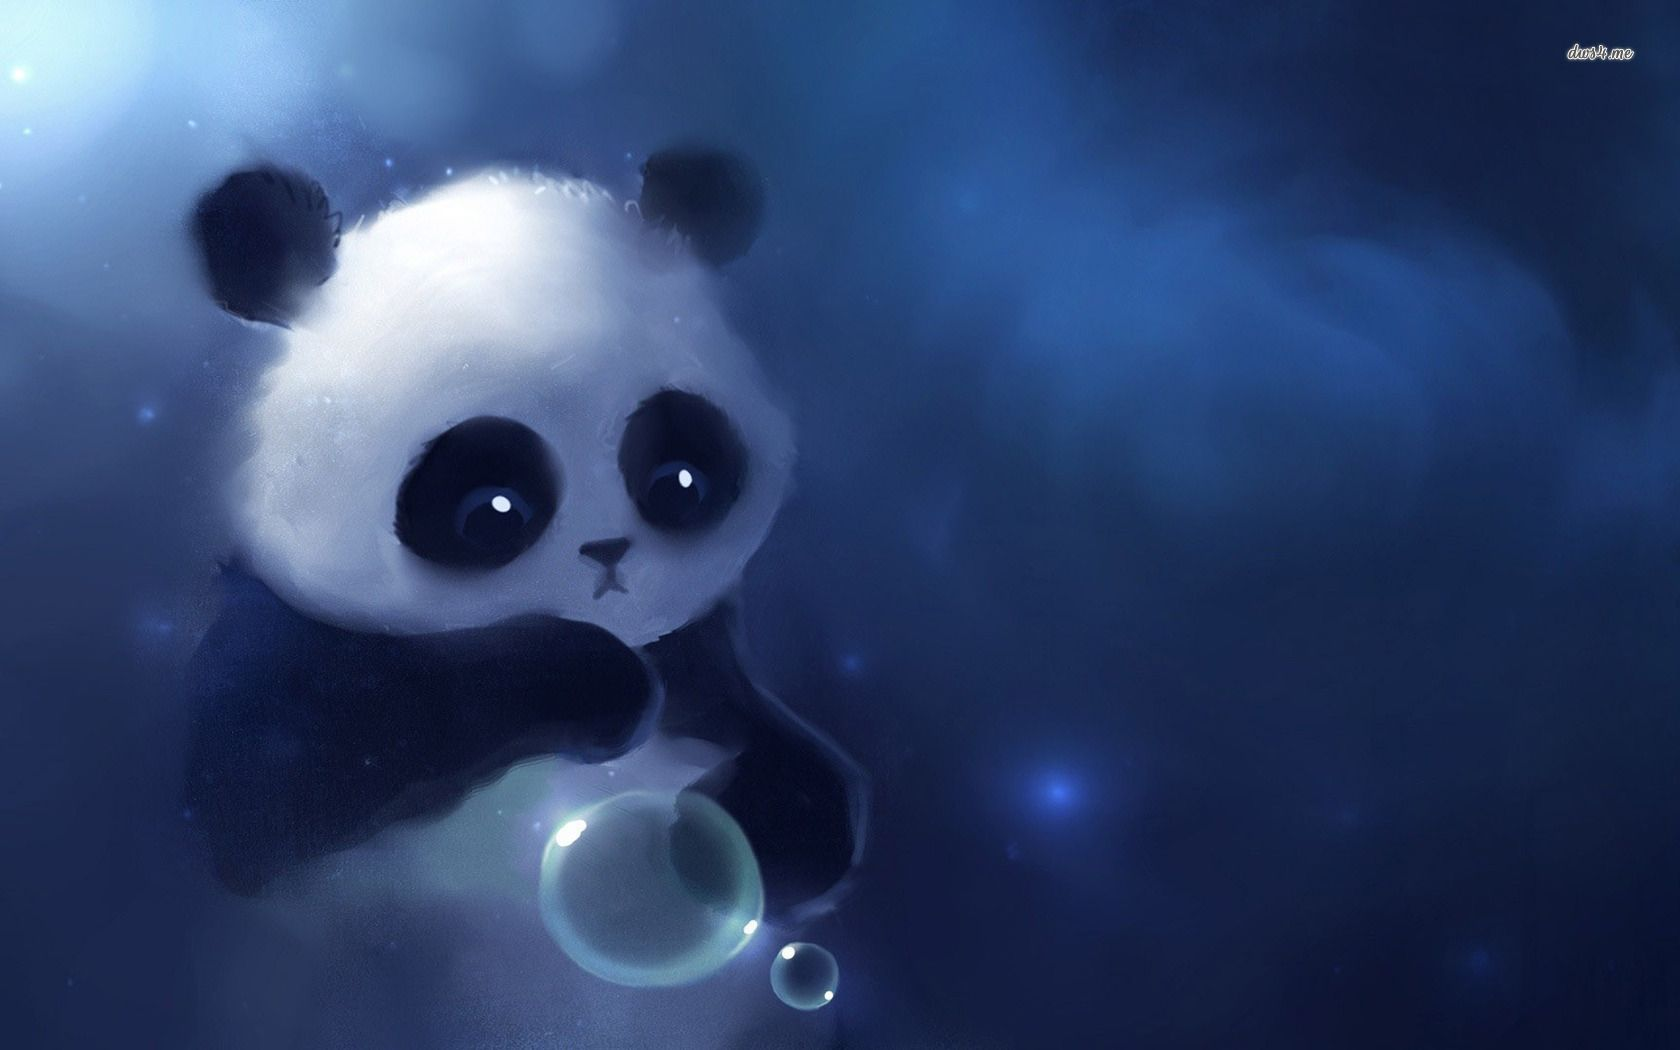 11346 Cute Baby Panda 1680x1050 Artistic Wallpaper